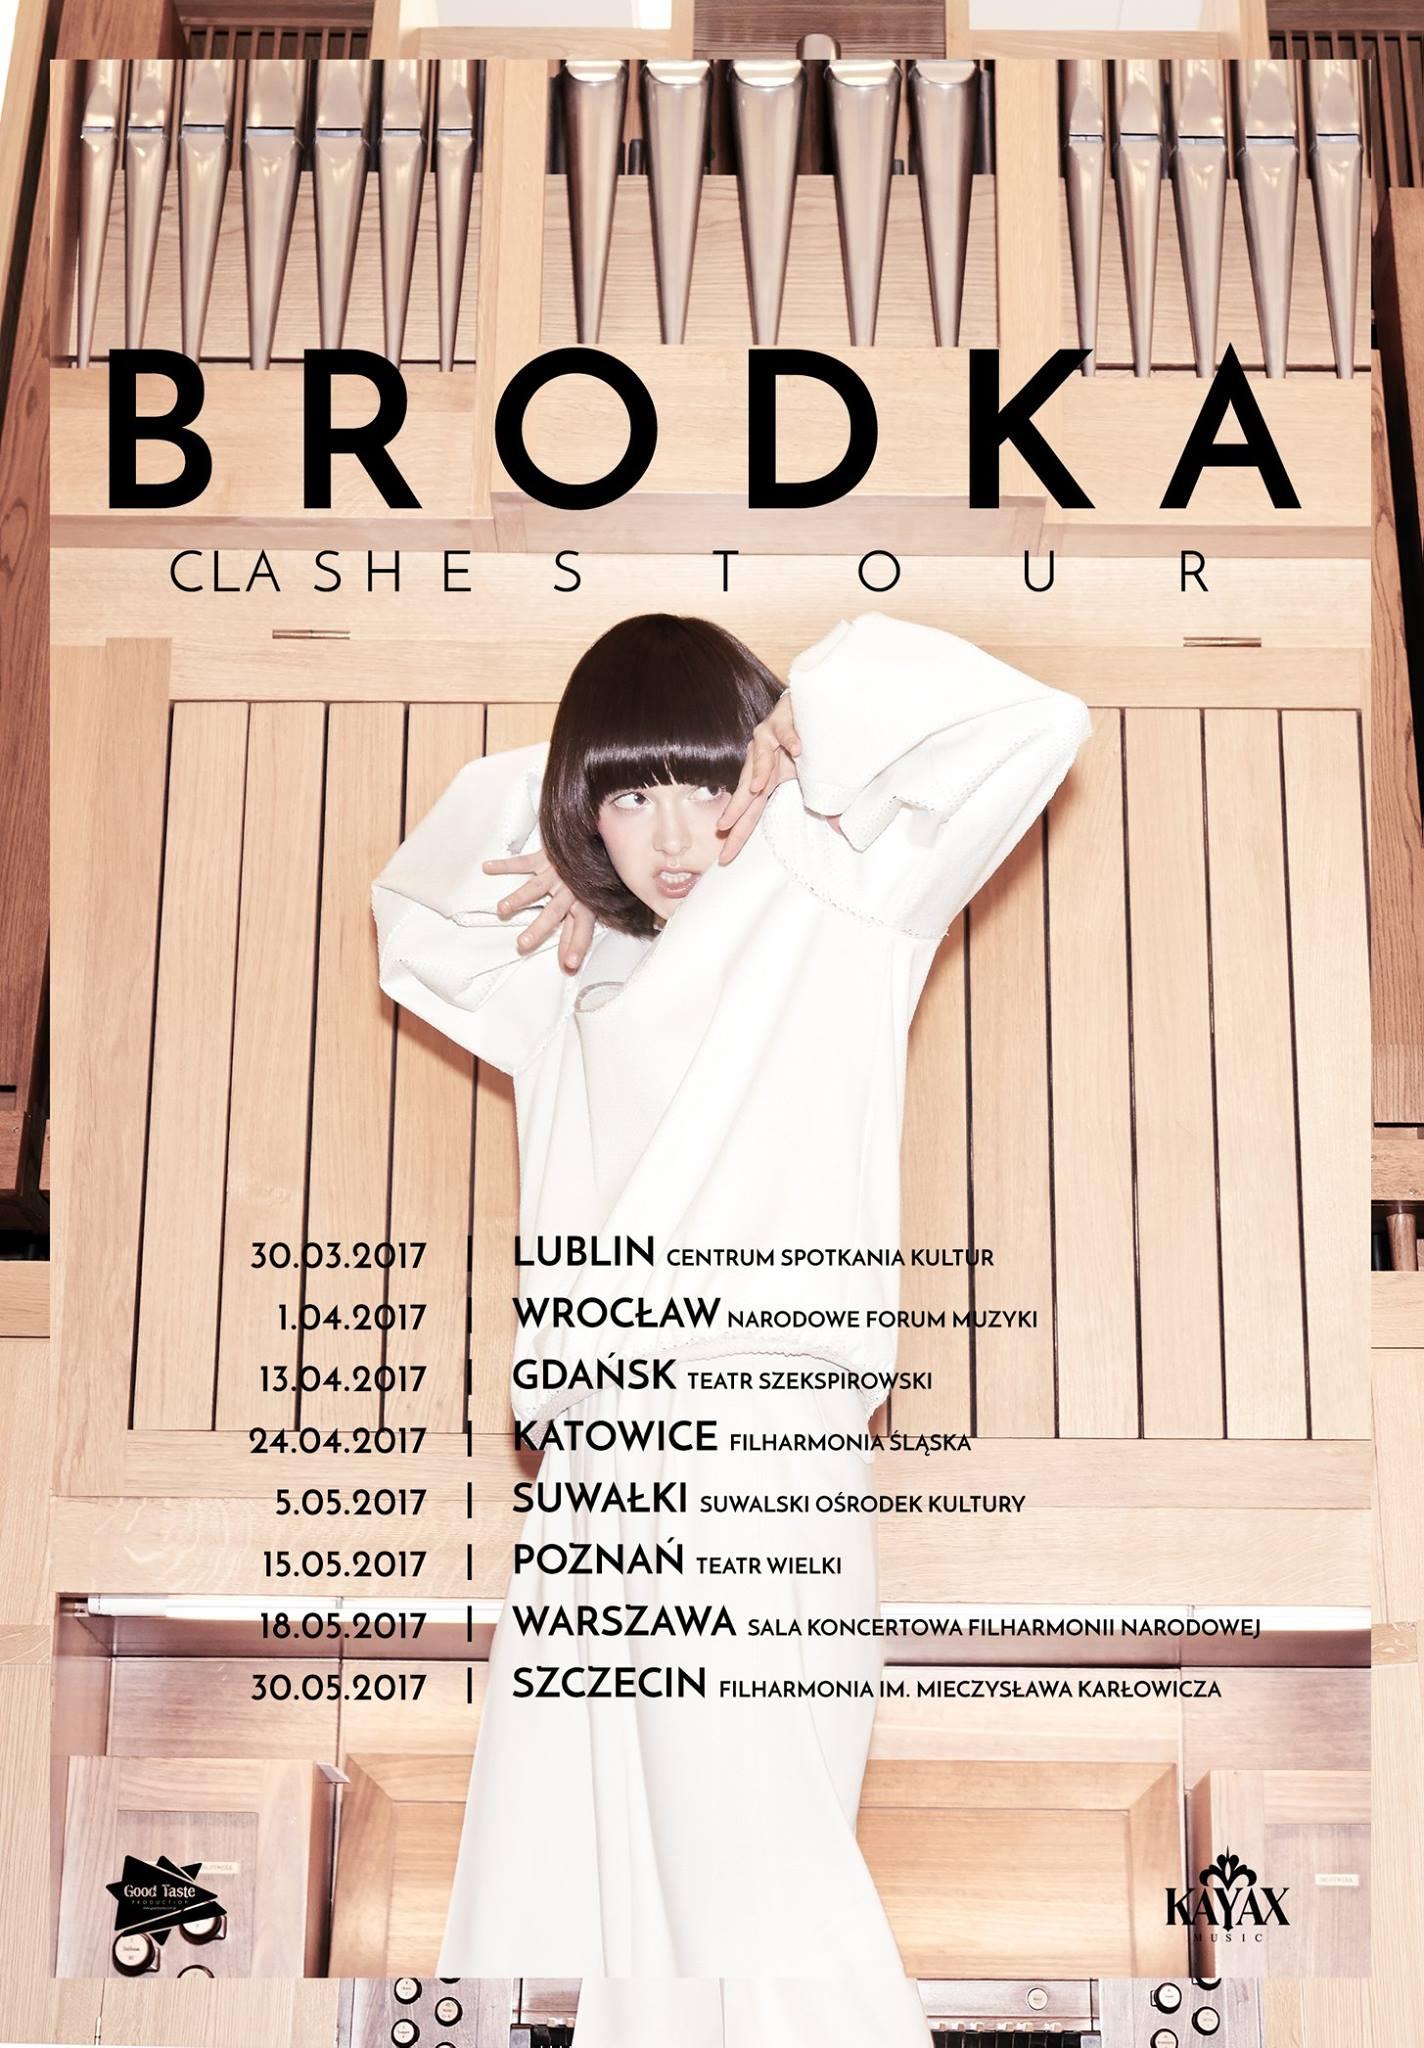 brodka koncerty 2017